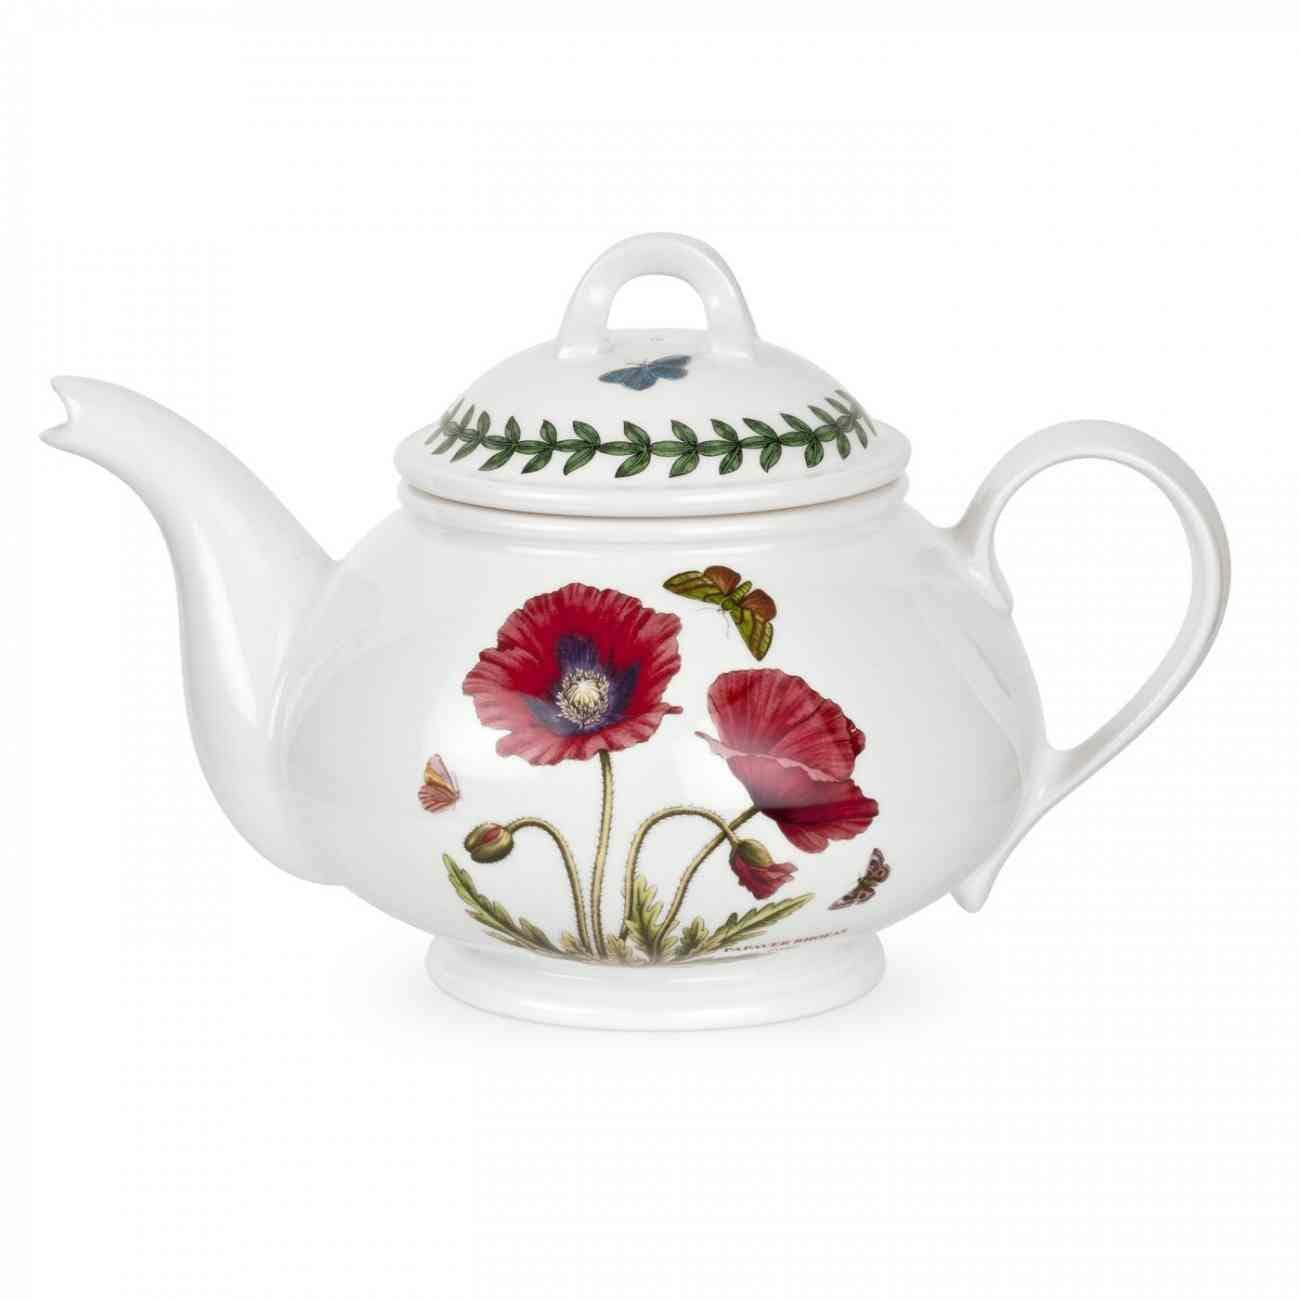 PORTMEIRION - Botanic Garden Poppy Teapot